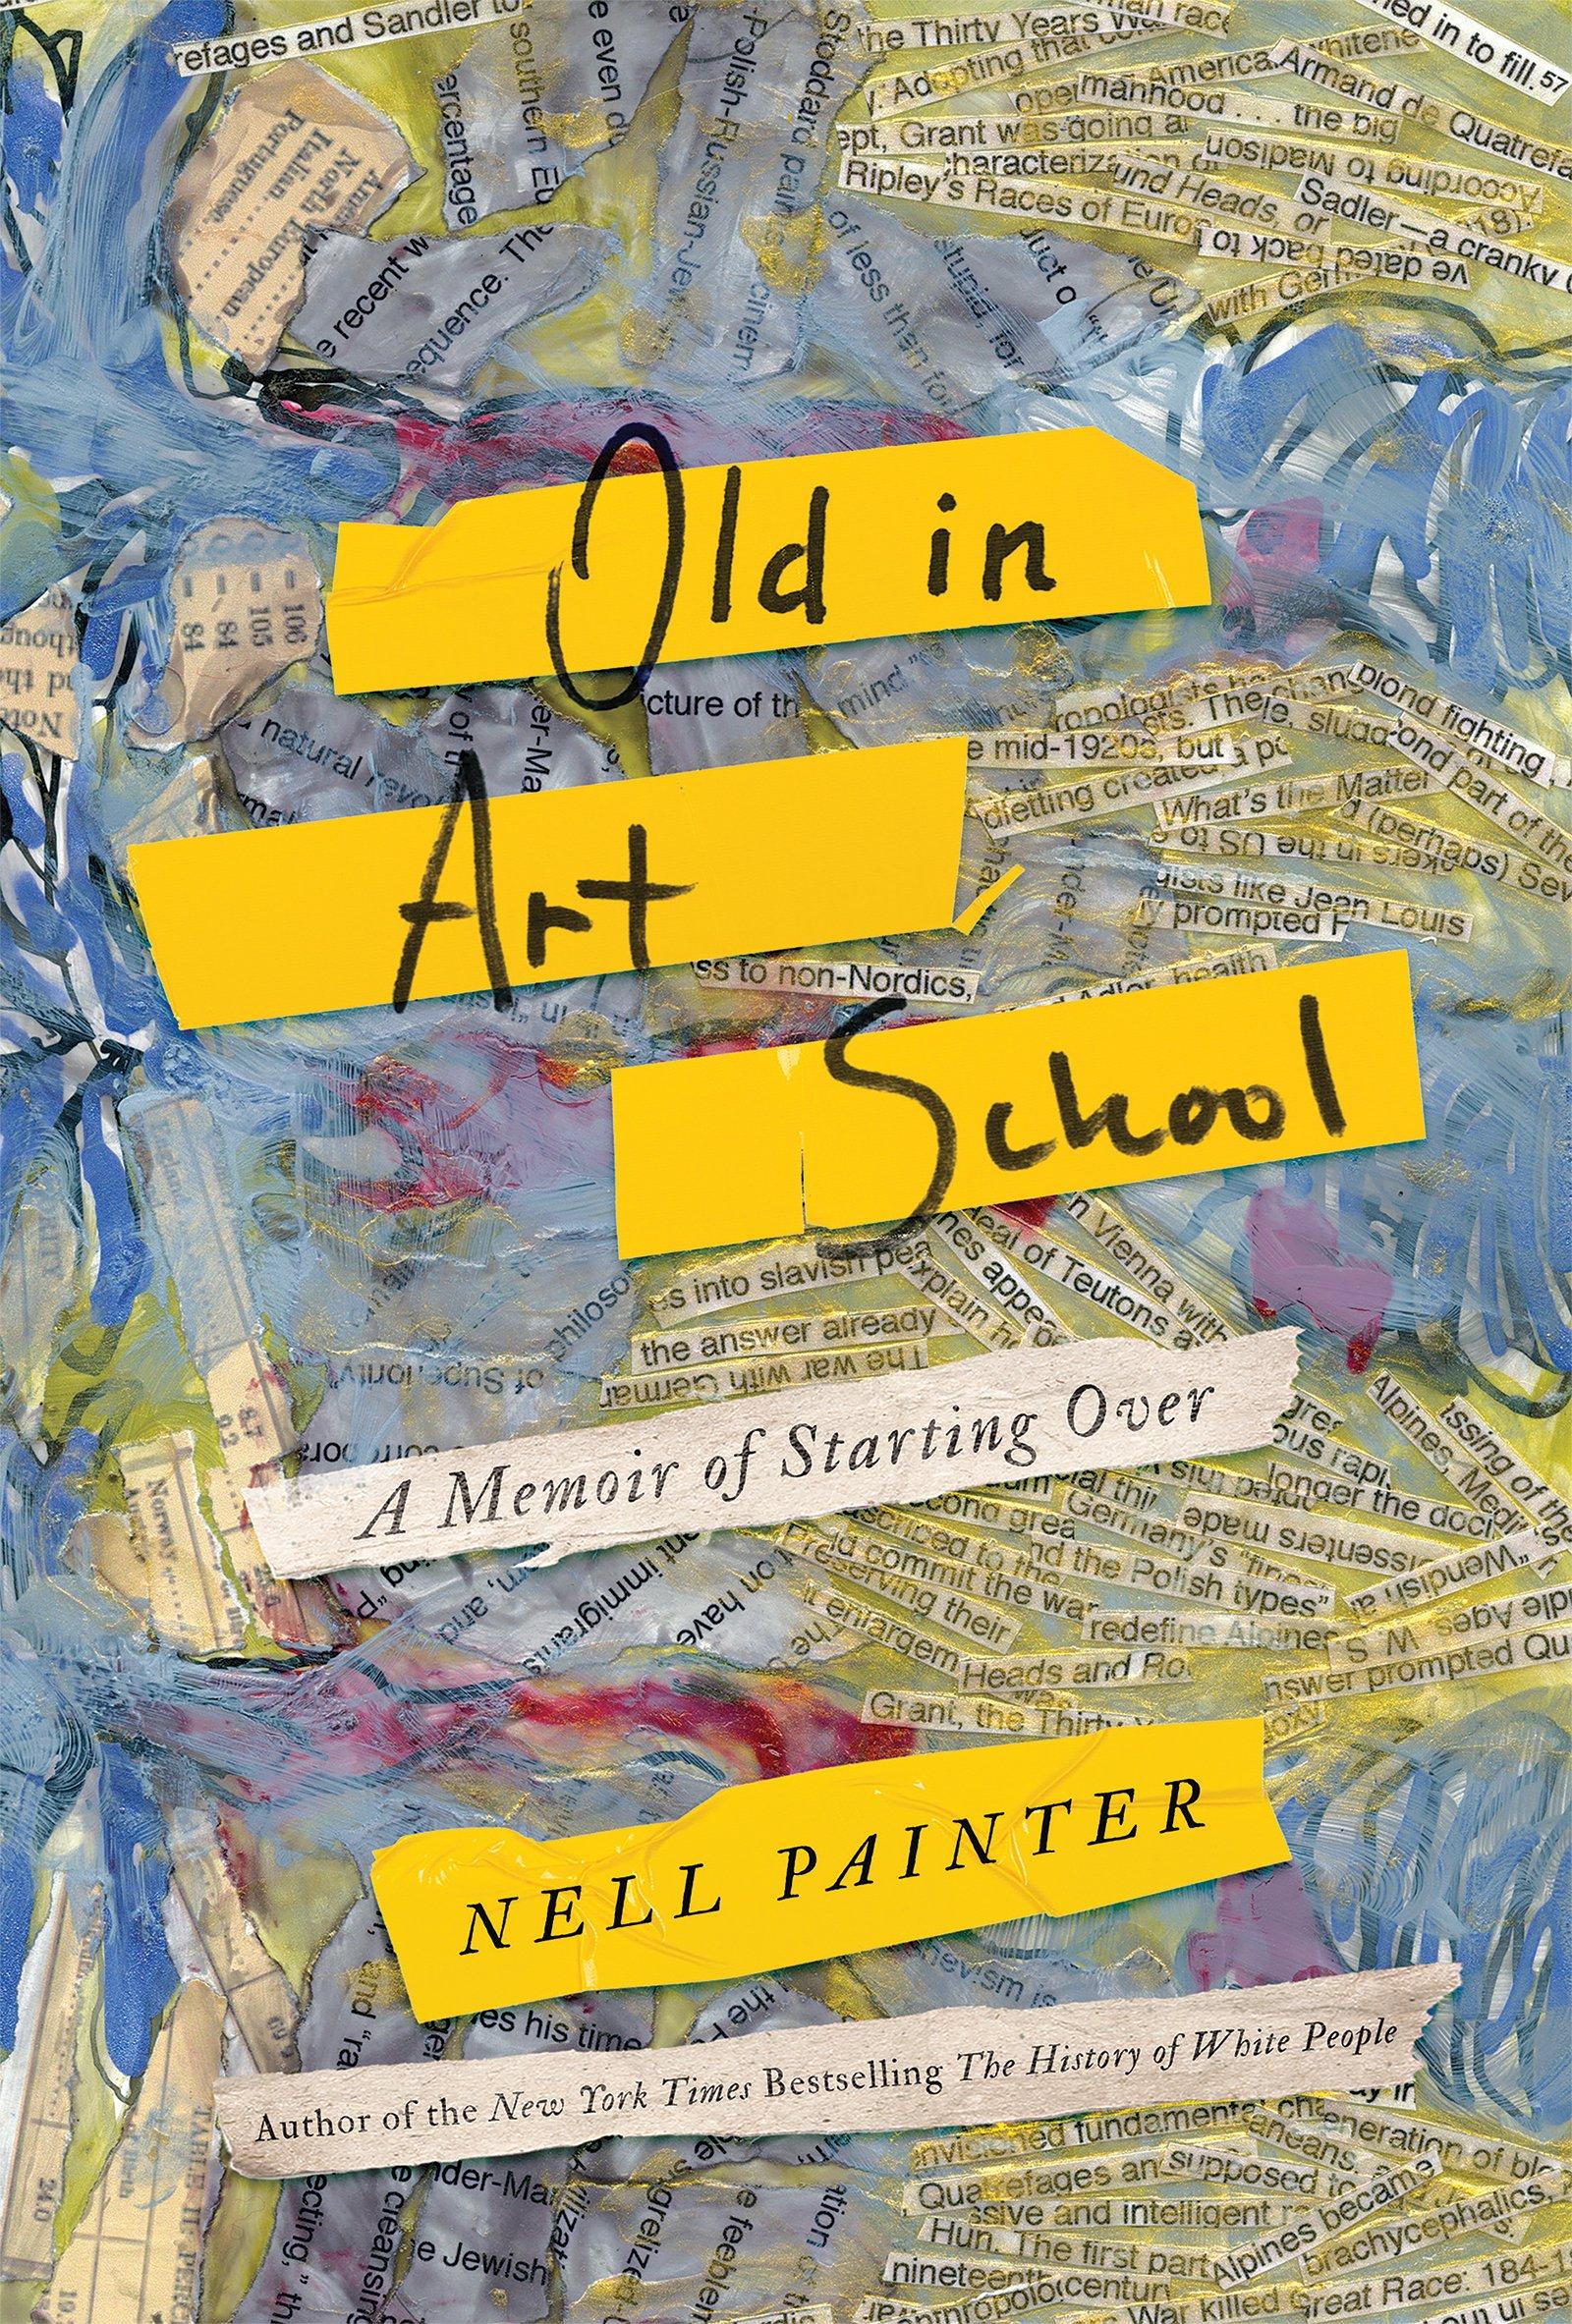 ec1f61df73ca Old in Art School: A Memoir of Starting Over: Amazon.co.uk: Nell ...